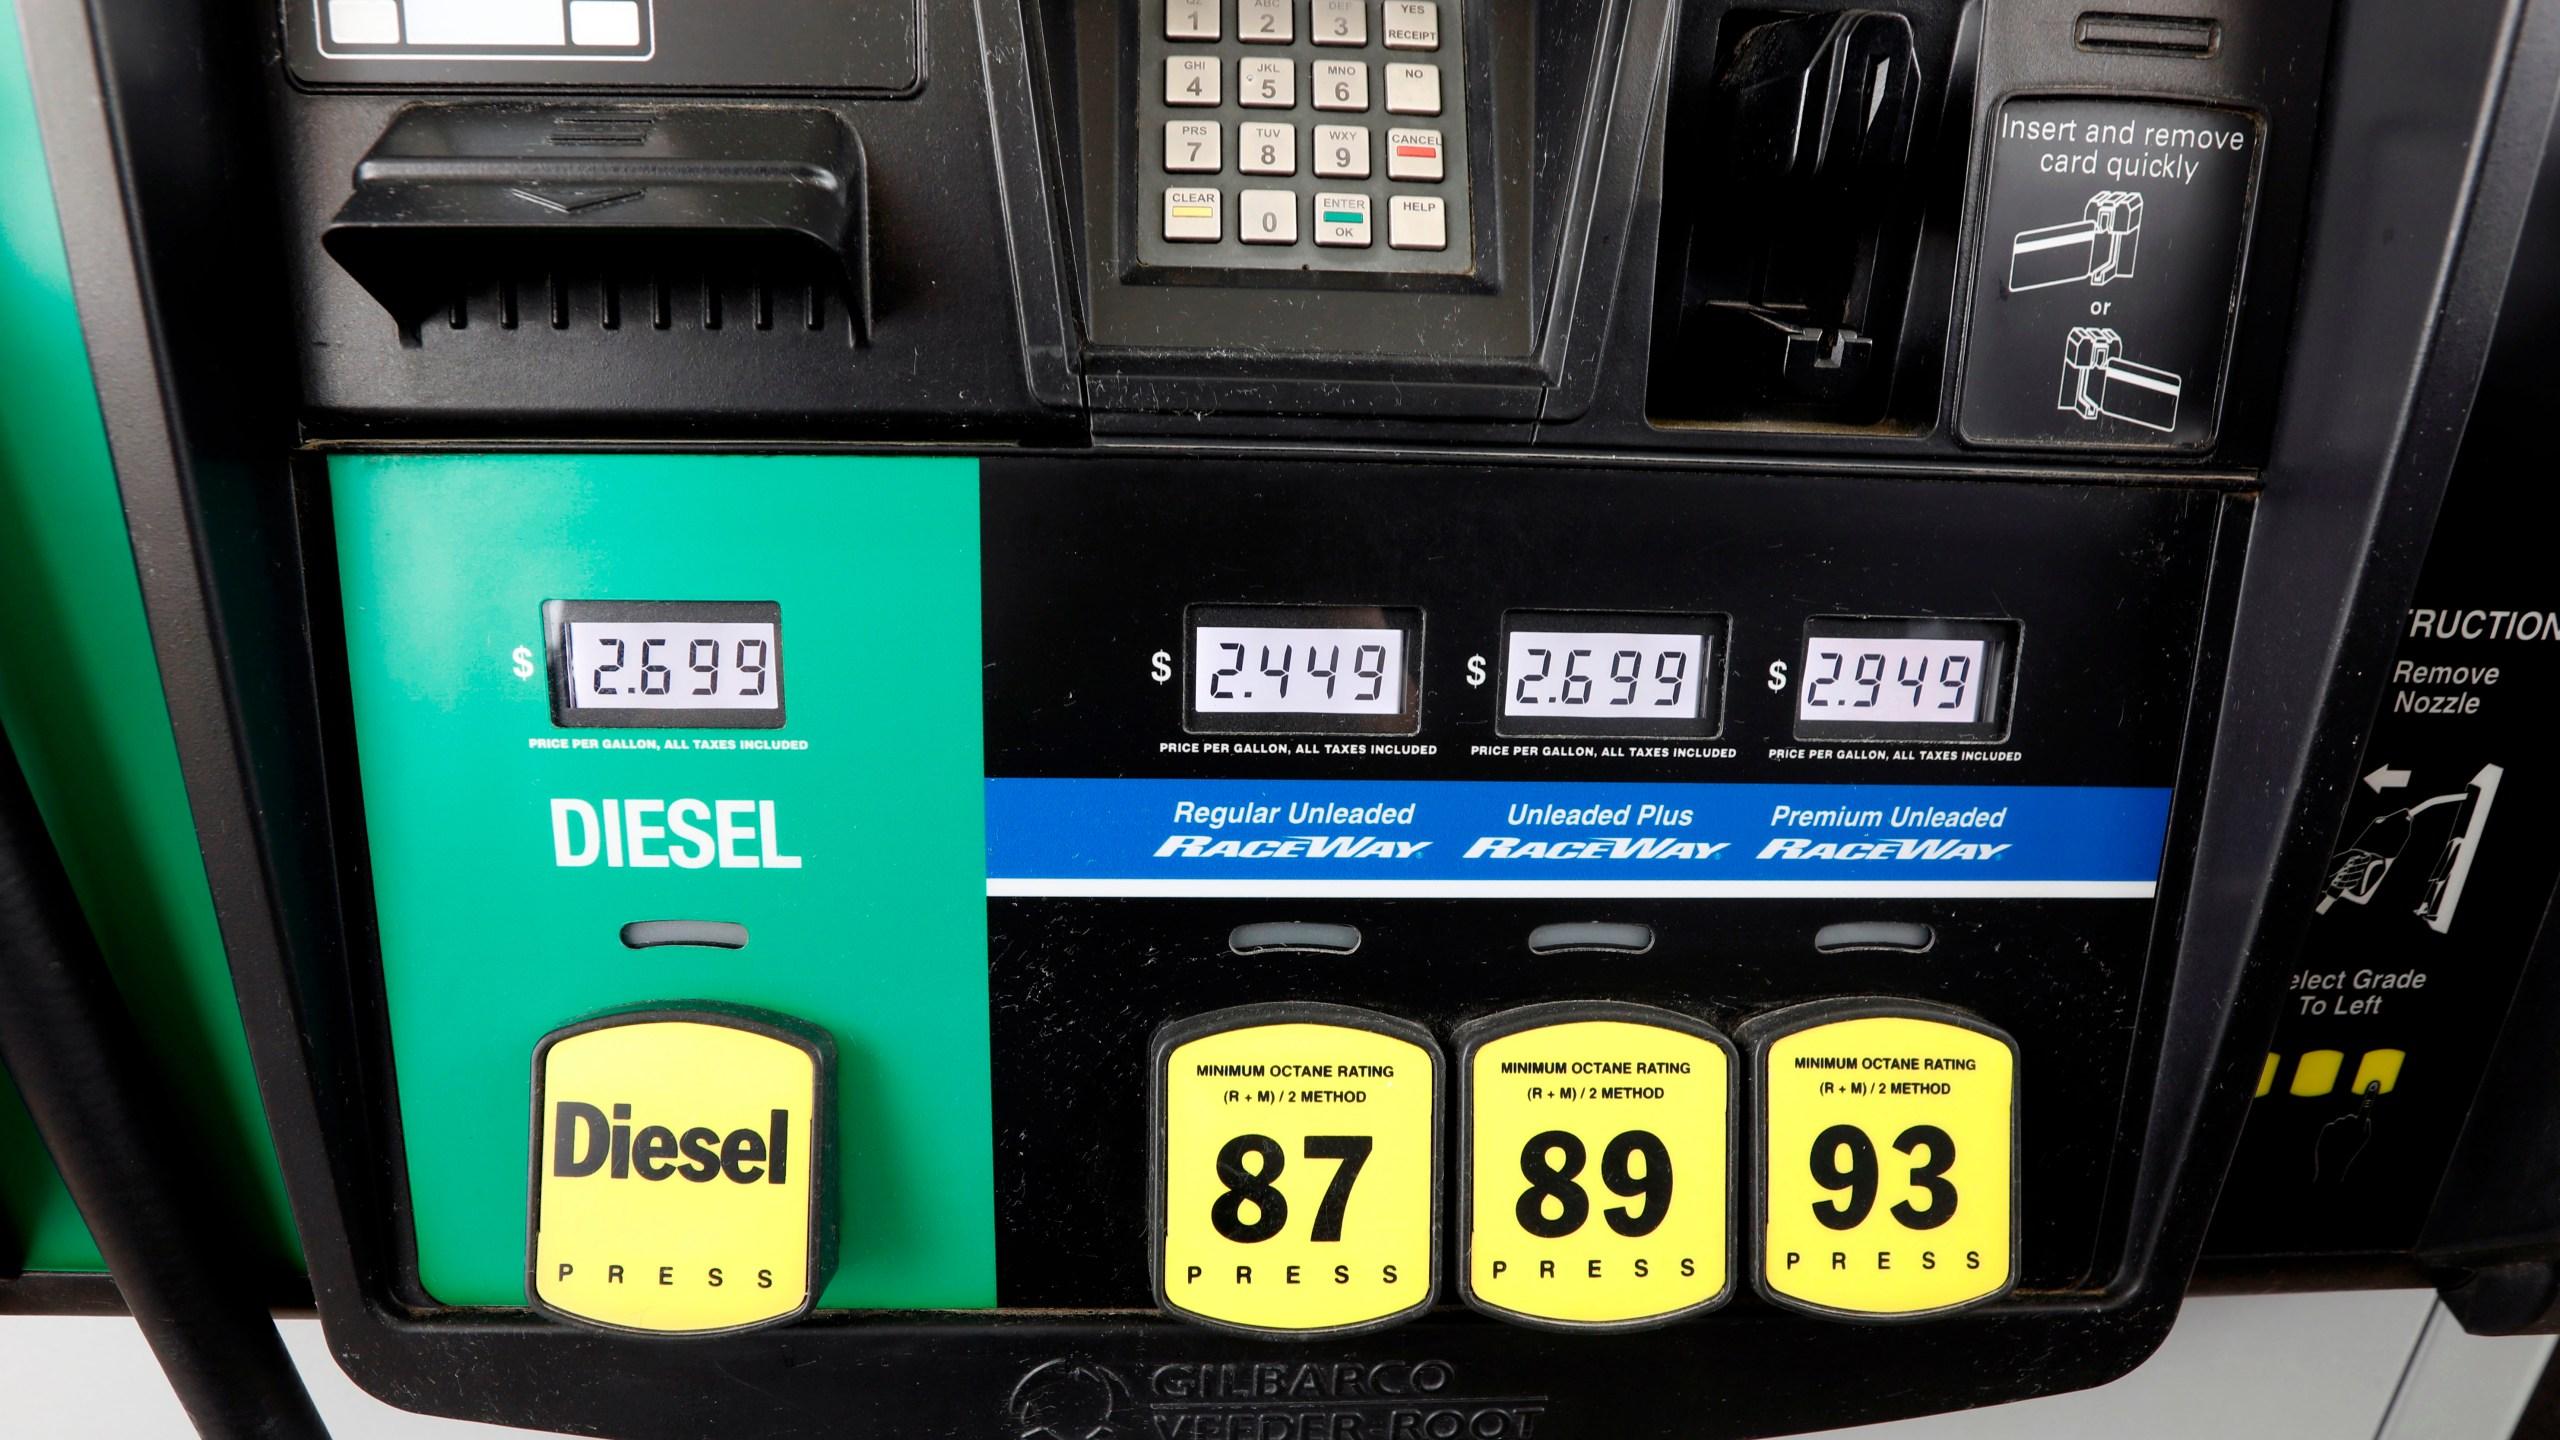 Rising_Gasoline_Prices_33415-159532.jpg23501895